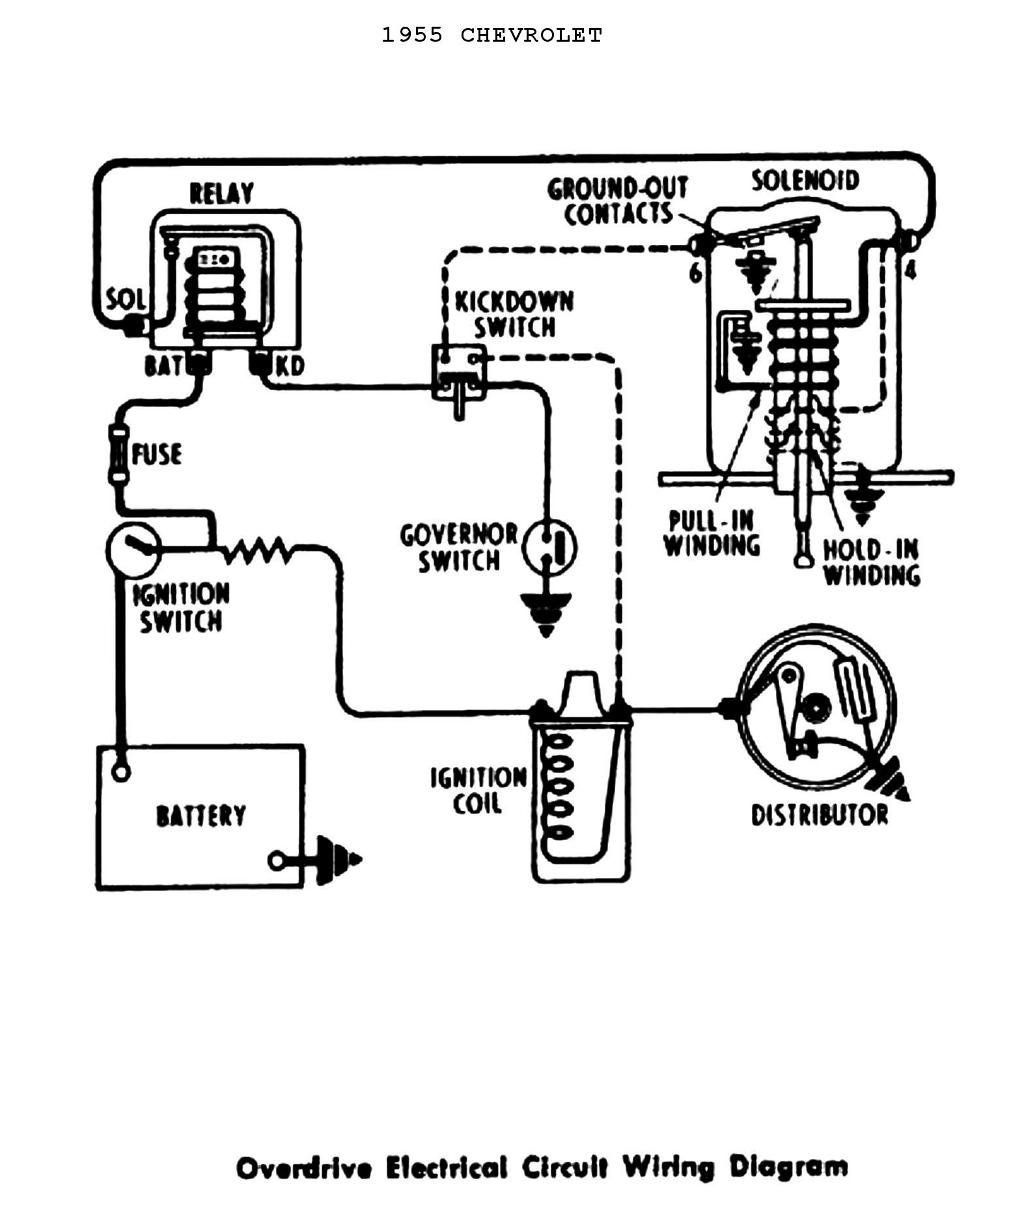 chevy hei distributor wiring diagram 1957 chevy hei wiring harness diagram wiring diagram data  1957 chevy hei wiring harness diagram